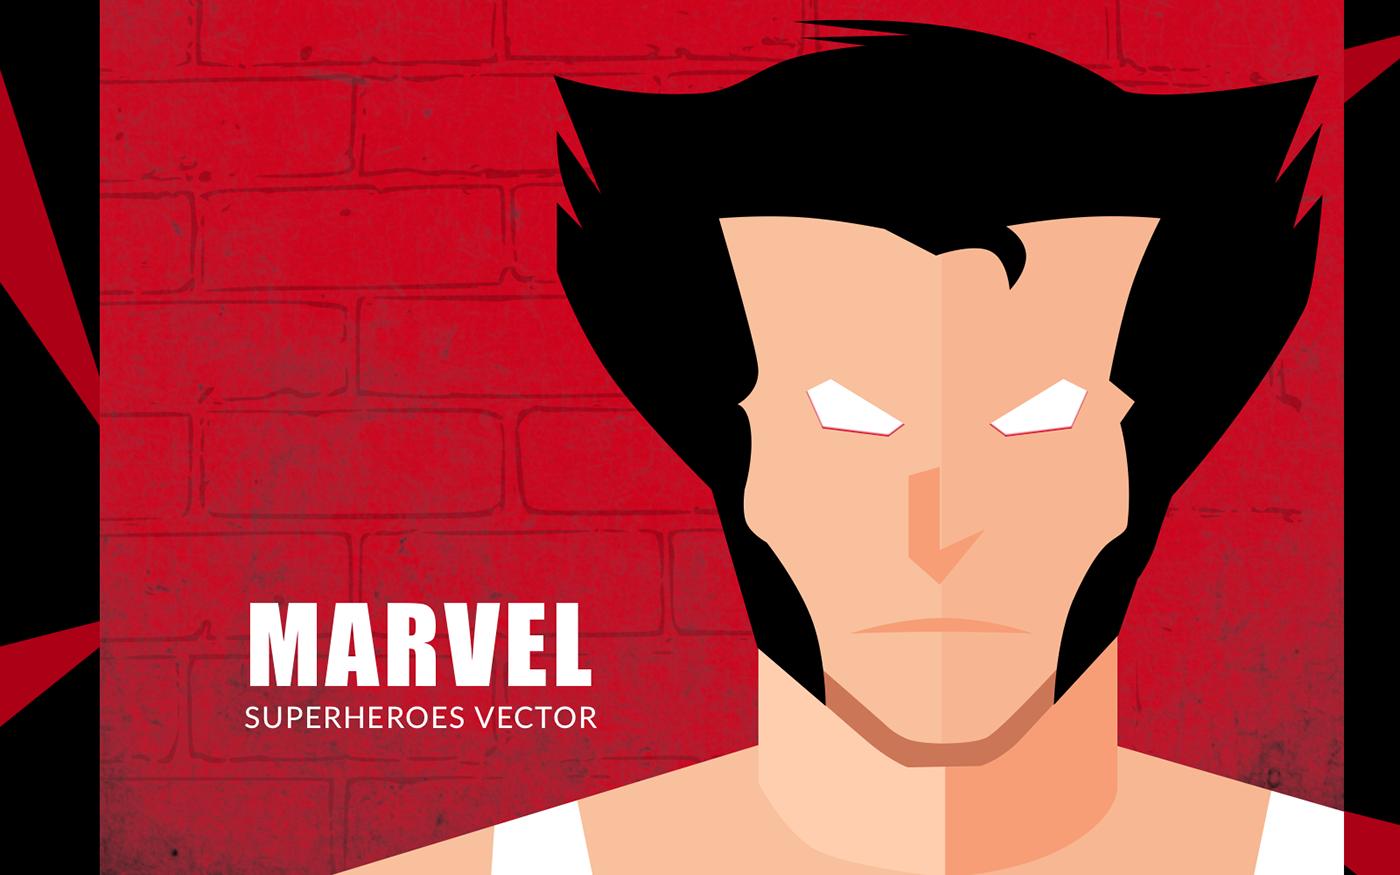 1400x875 Marvel Superheroes Vector Design On Behance